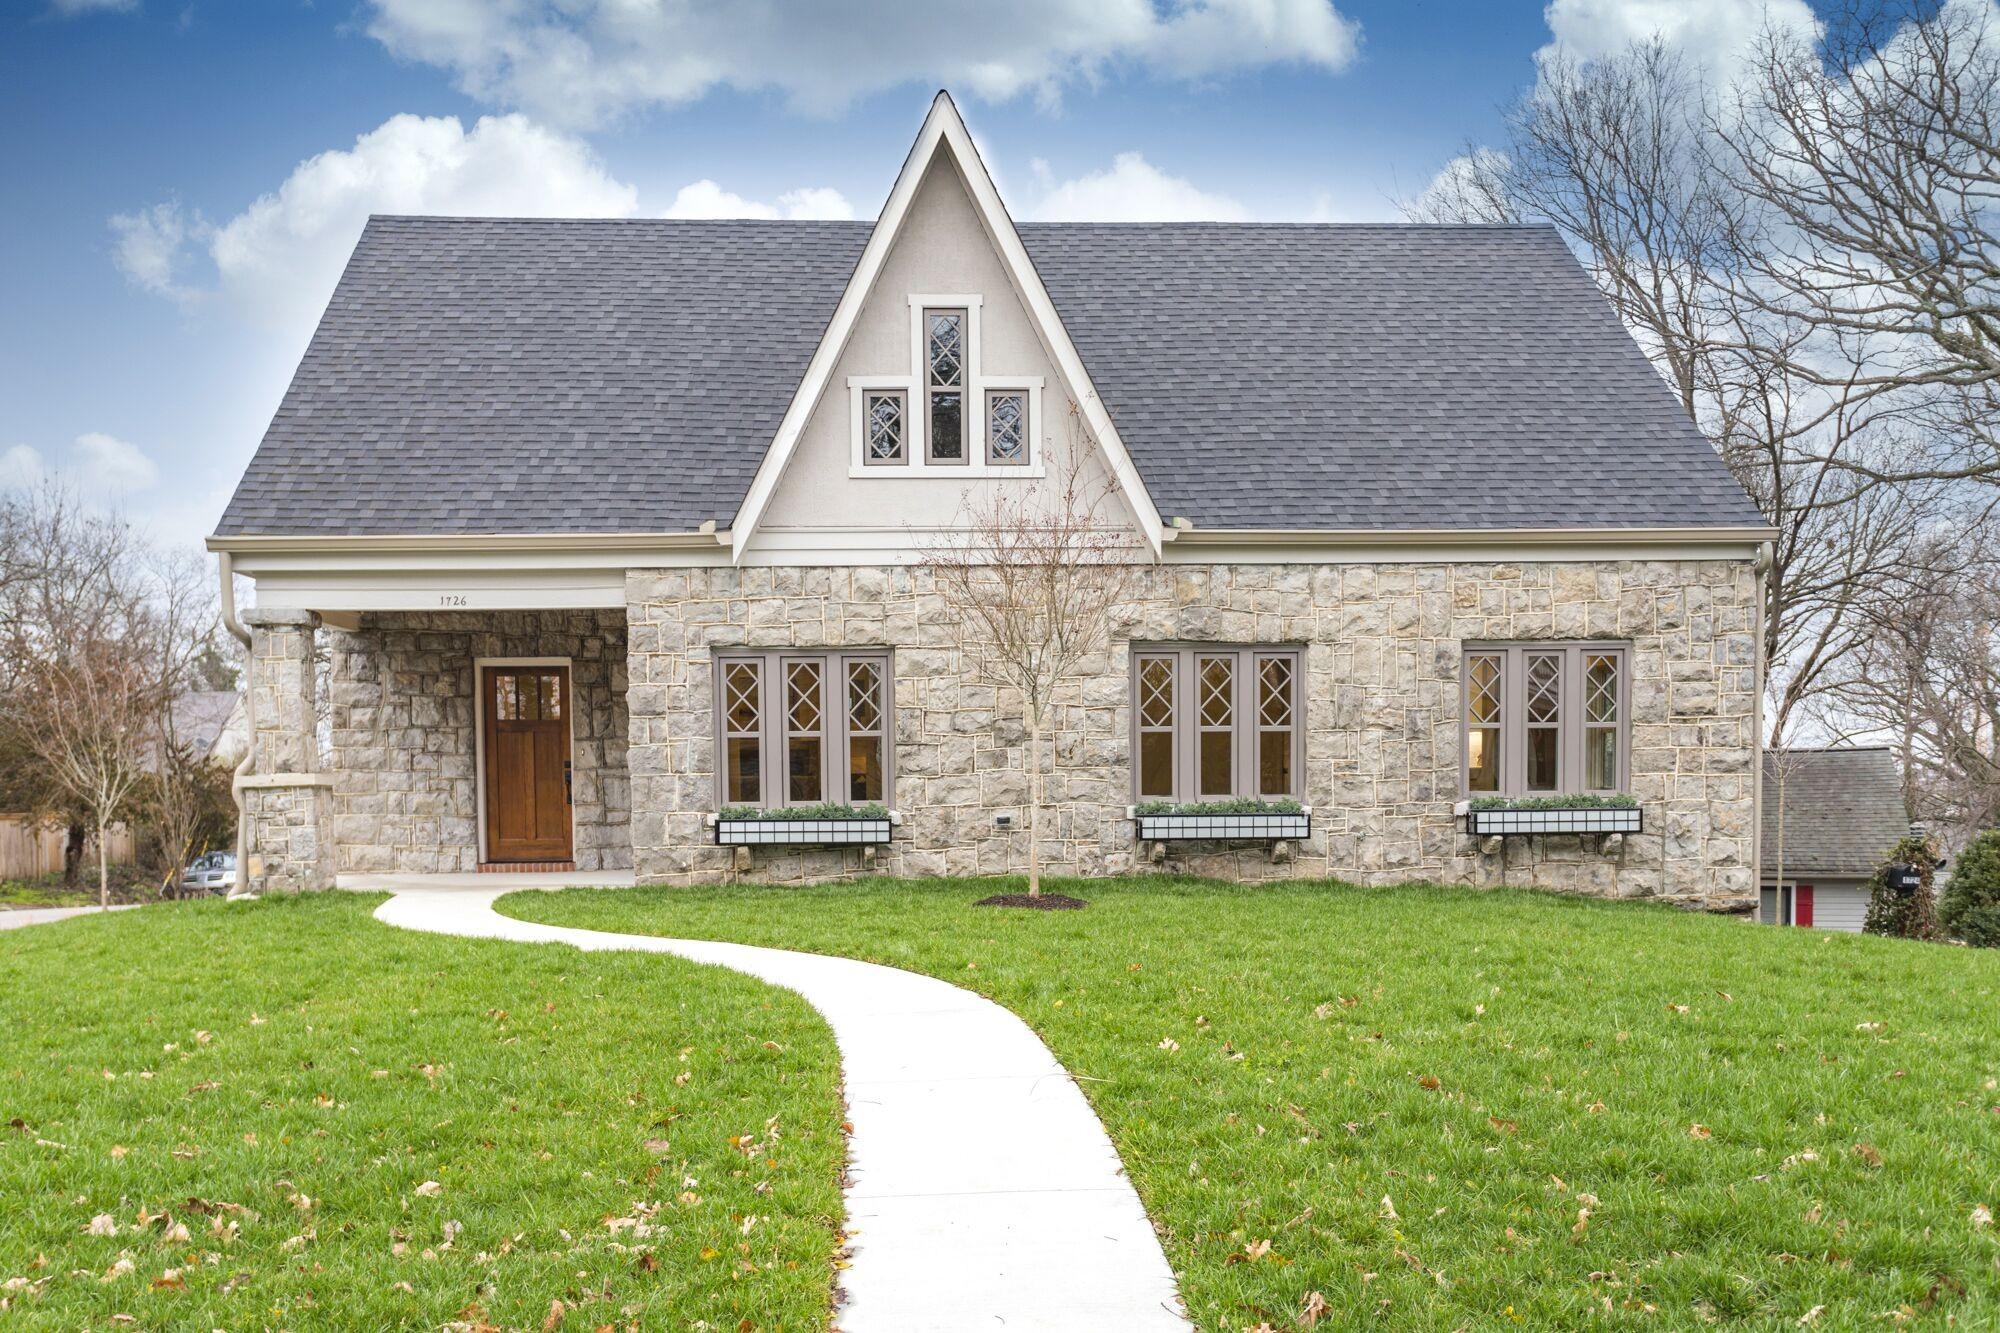 $1,680,000 - 4Br/5Ba -  for Sale in Blair/belmont Heights, Nashville